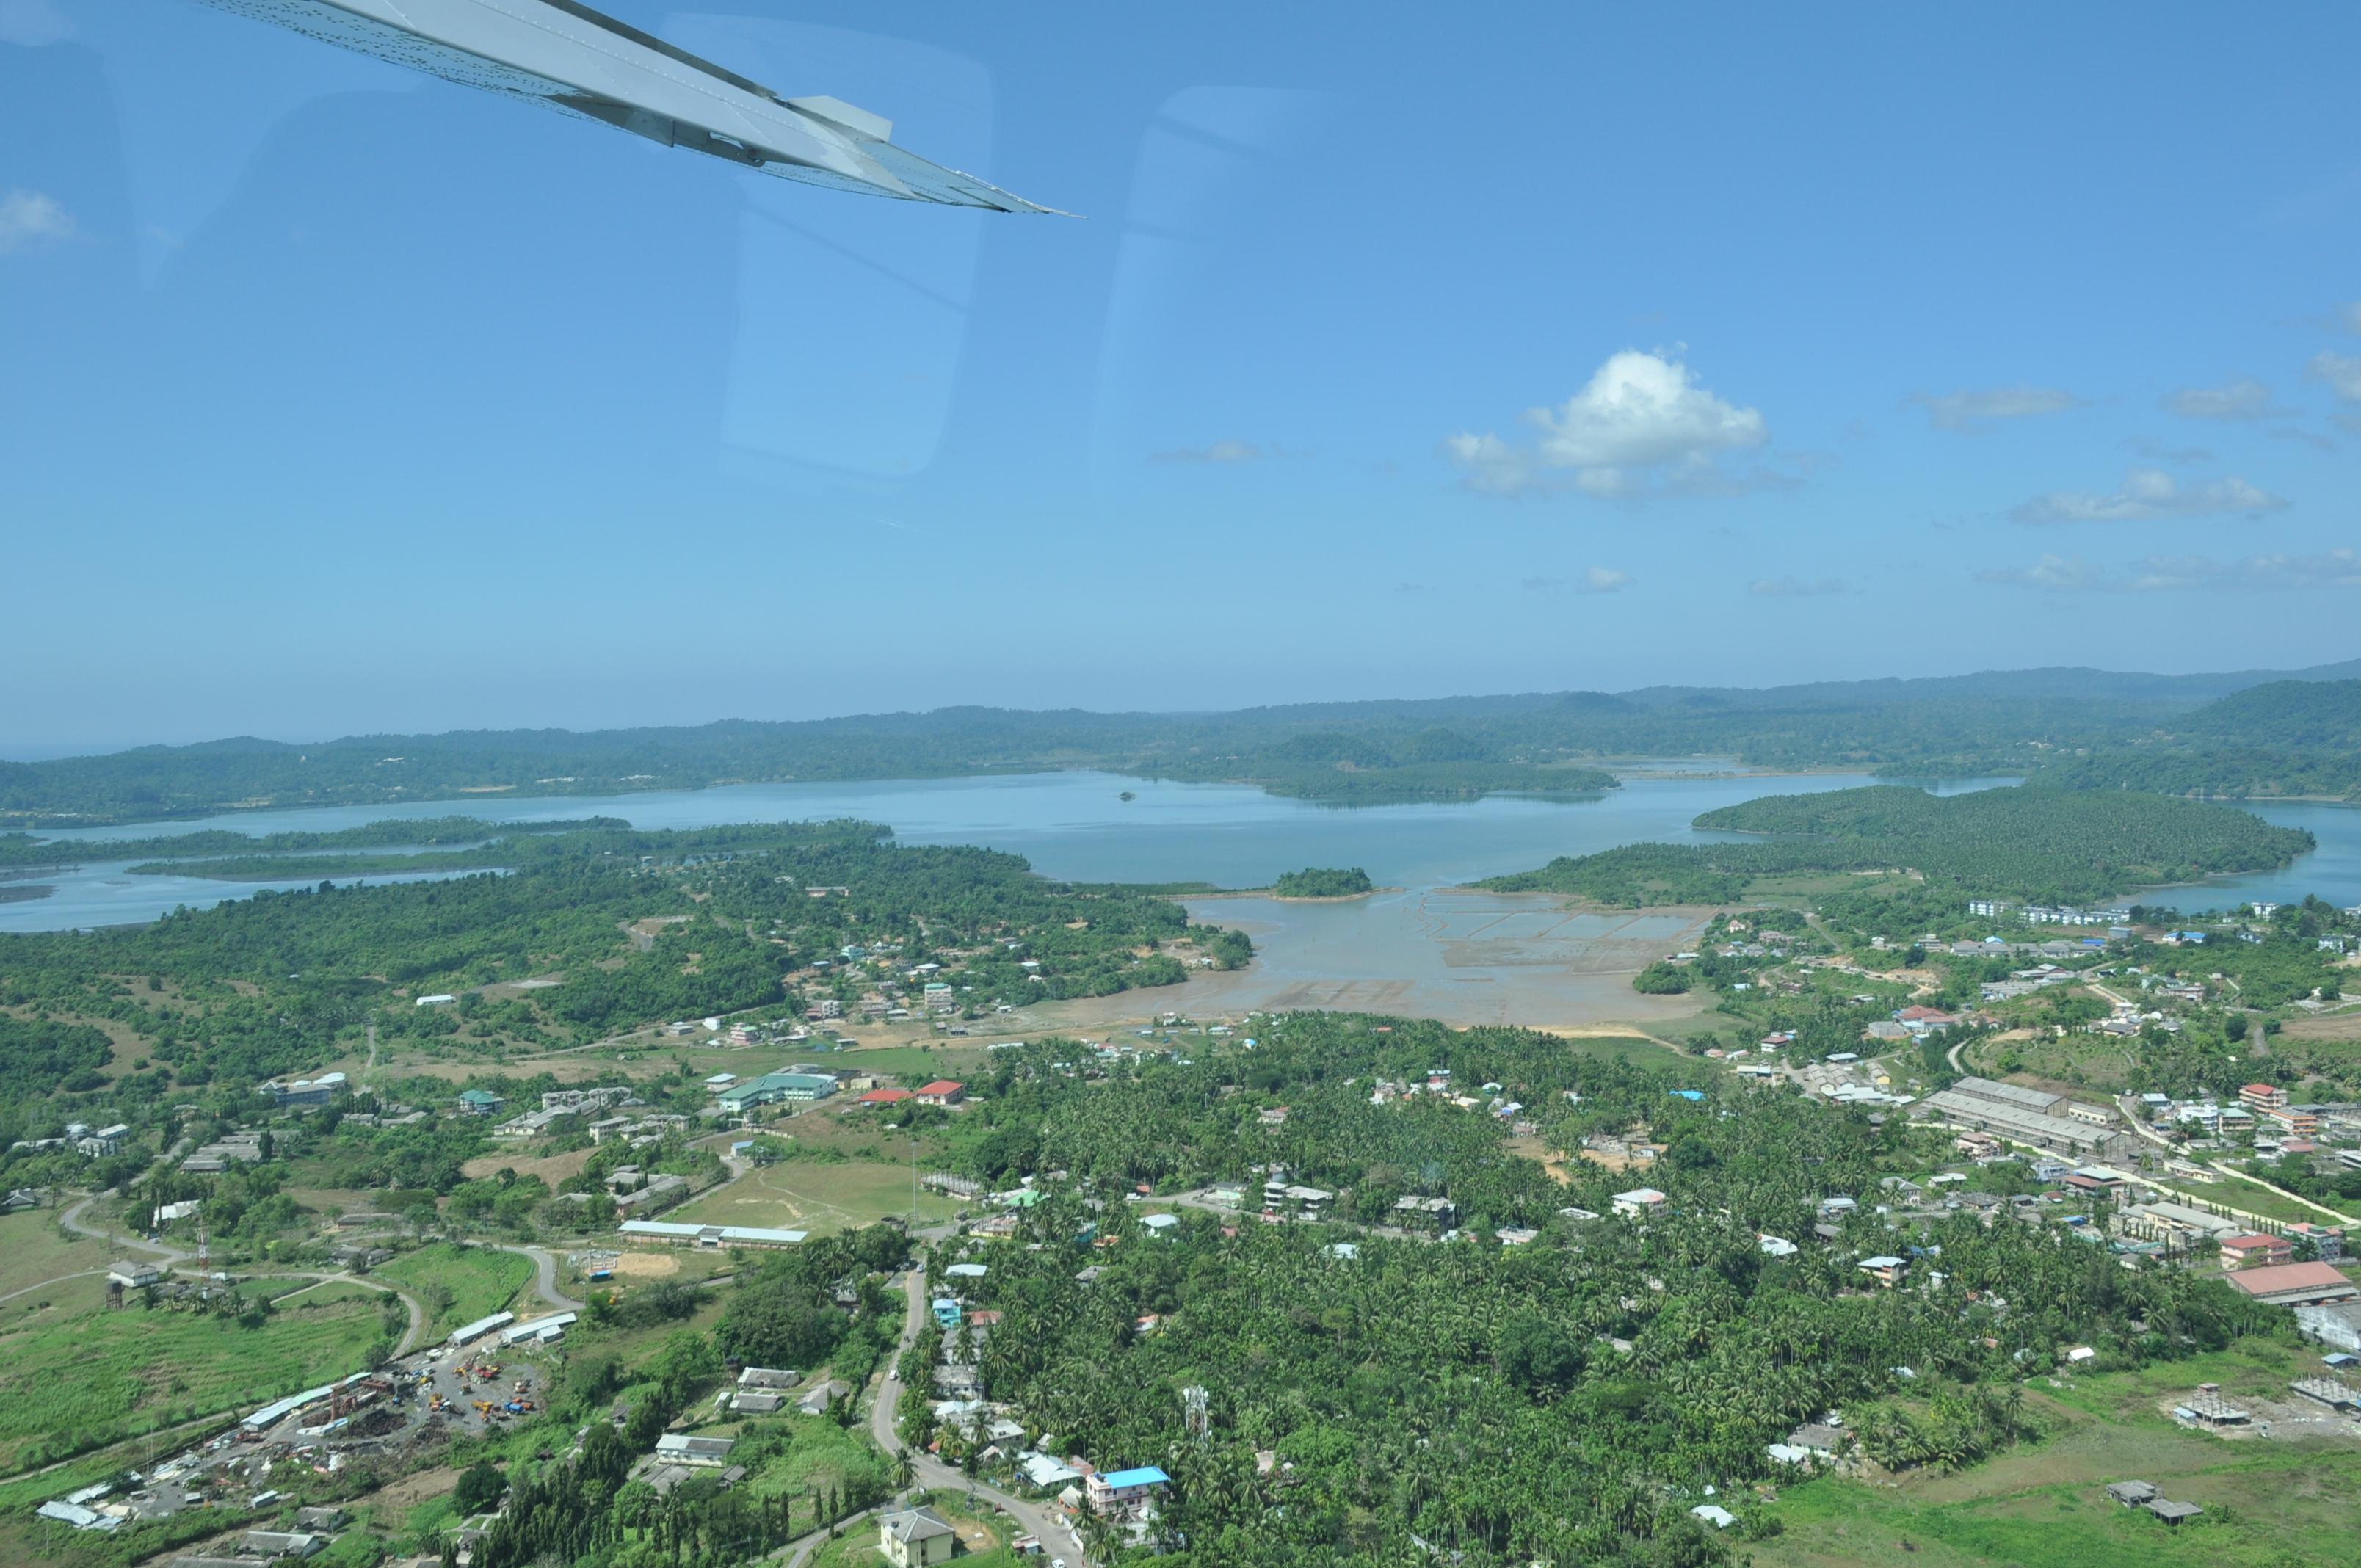 Aerial View of Diglipur, North Andaman Islands